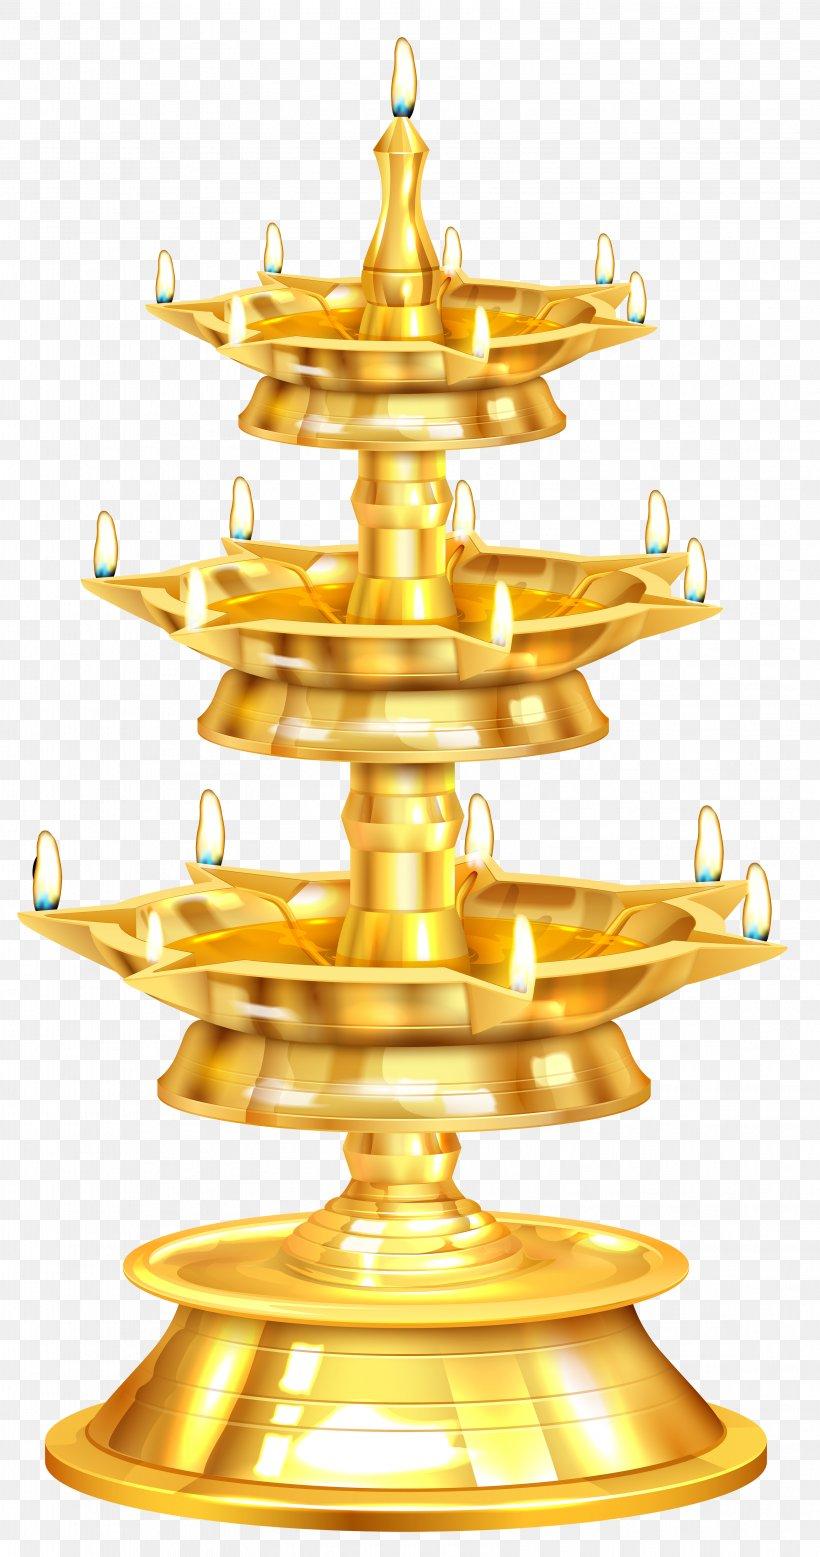 Diwali Clip Art, PNG, 3159x6000px, Diwali, Brass, Candle, Diya, Gold Download Free